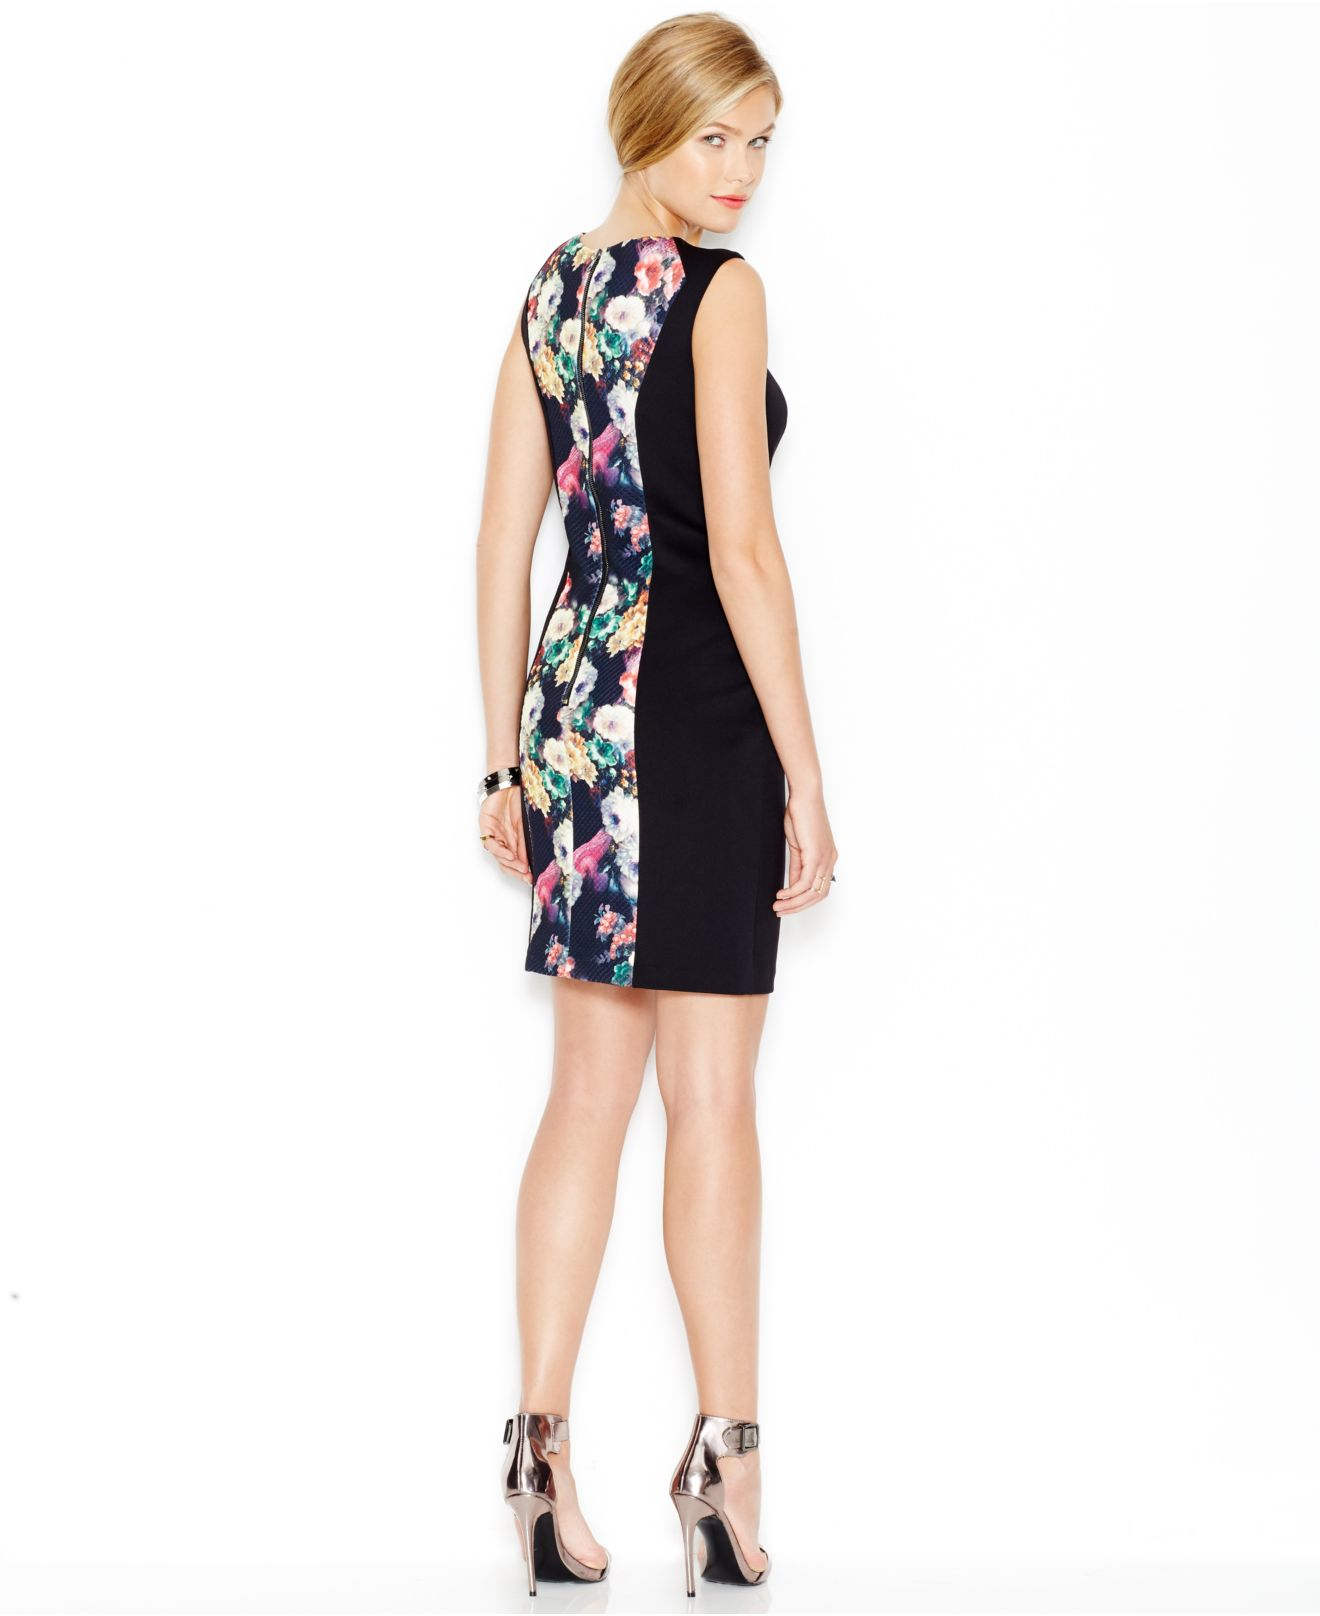 10e8c2db4c2 Lyst - Betsey Johnson Textured Floral-panel Sheath Dress in Black